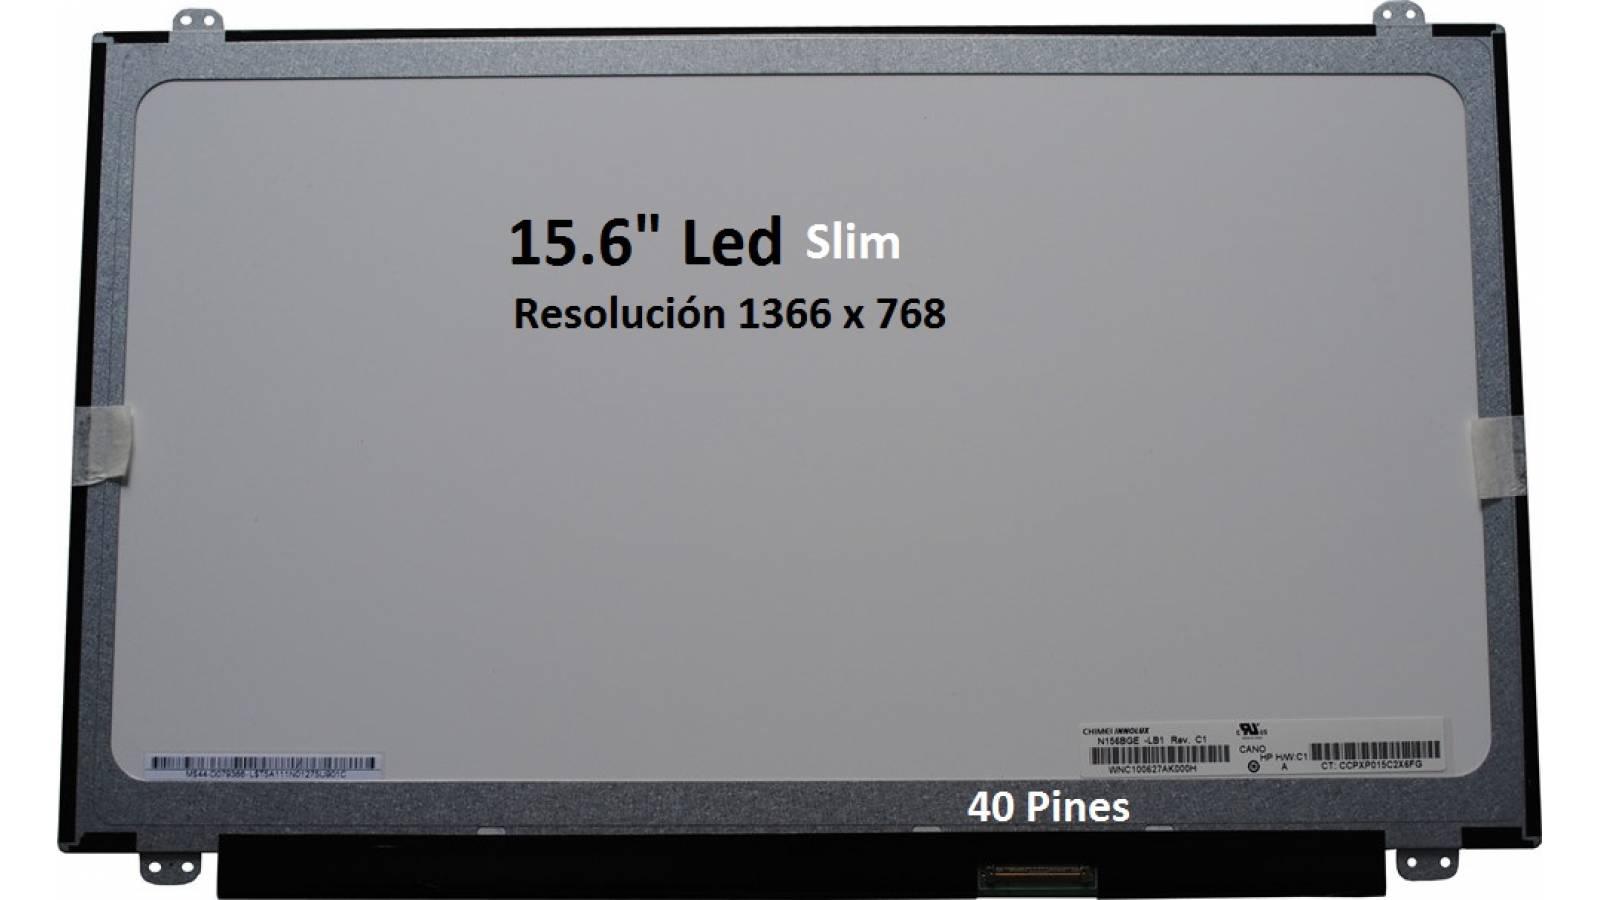 "PANTALLA 15.6"" LED SLIM N156BGE-LB1- 40 pines"